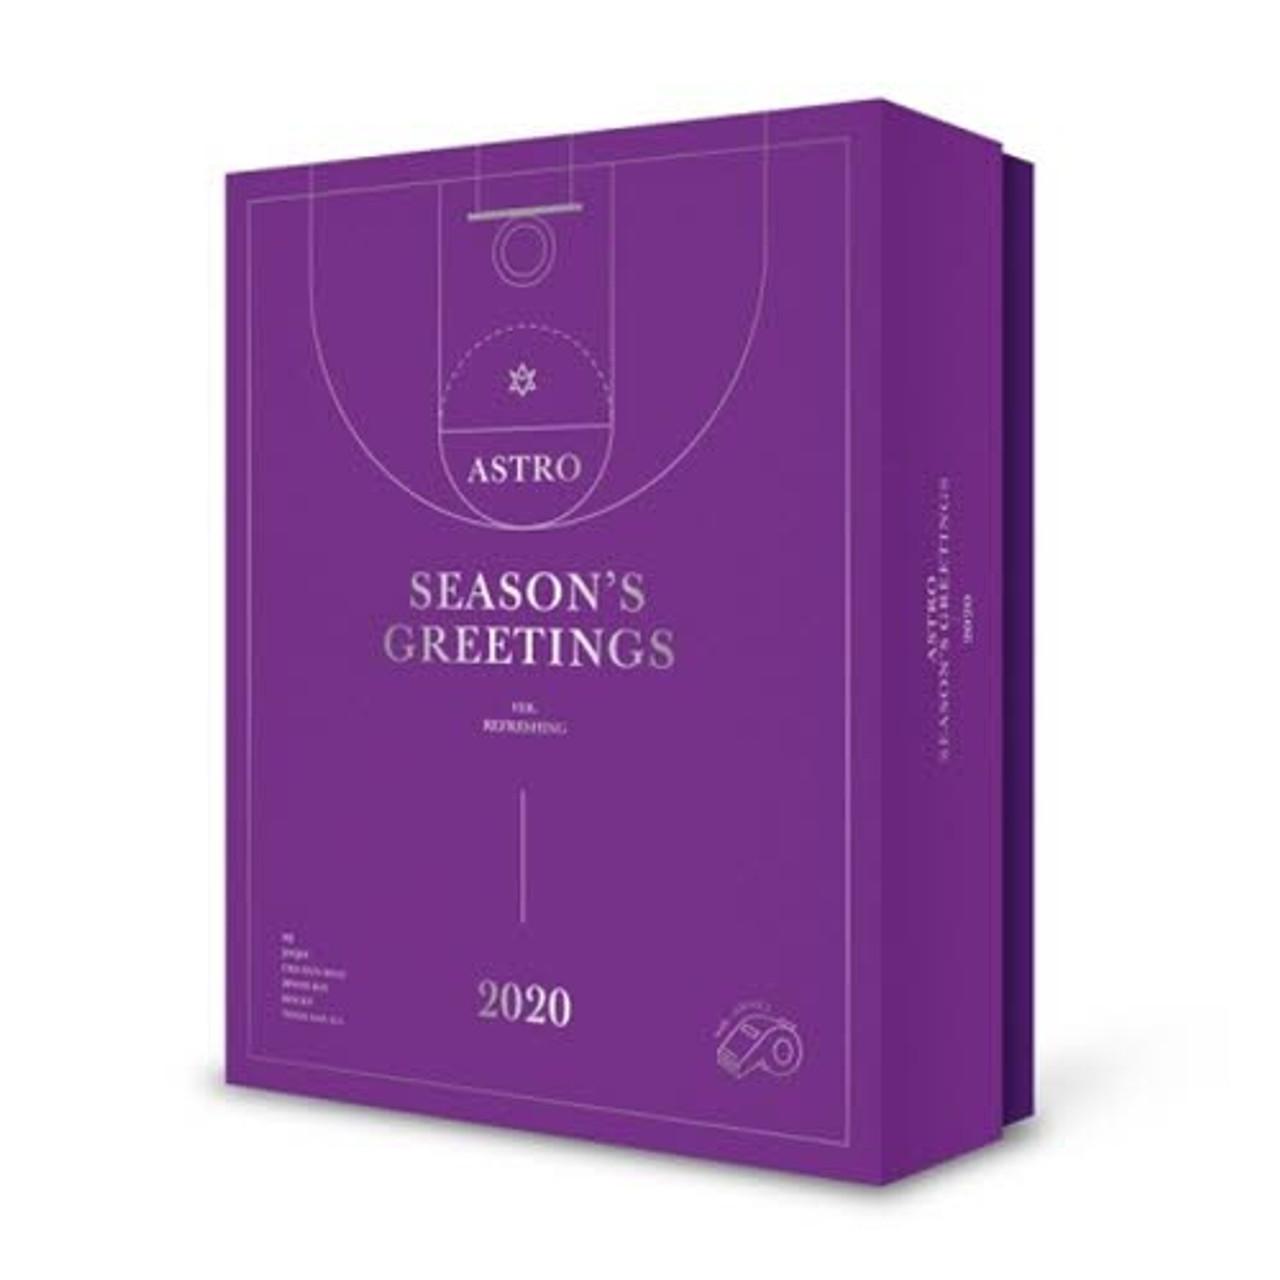 ASTRO - 2020 SEASONS GREETINGS (REFRESHING Ver.)